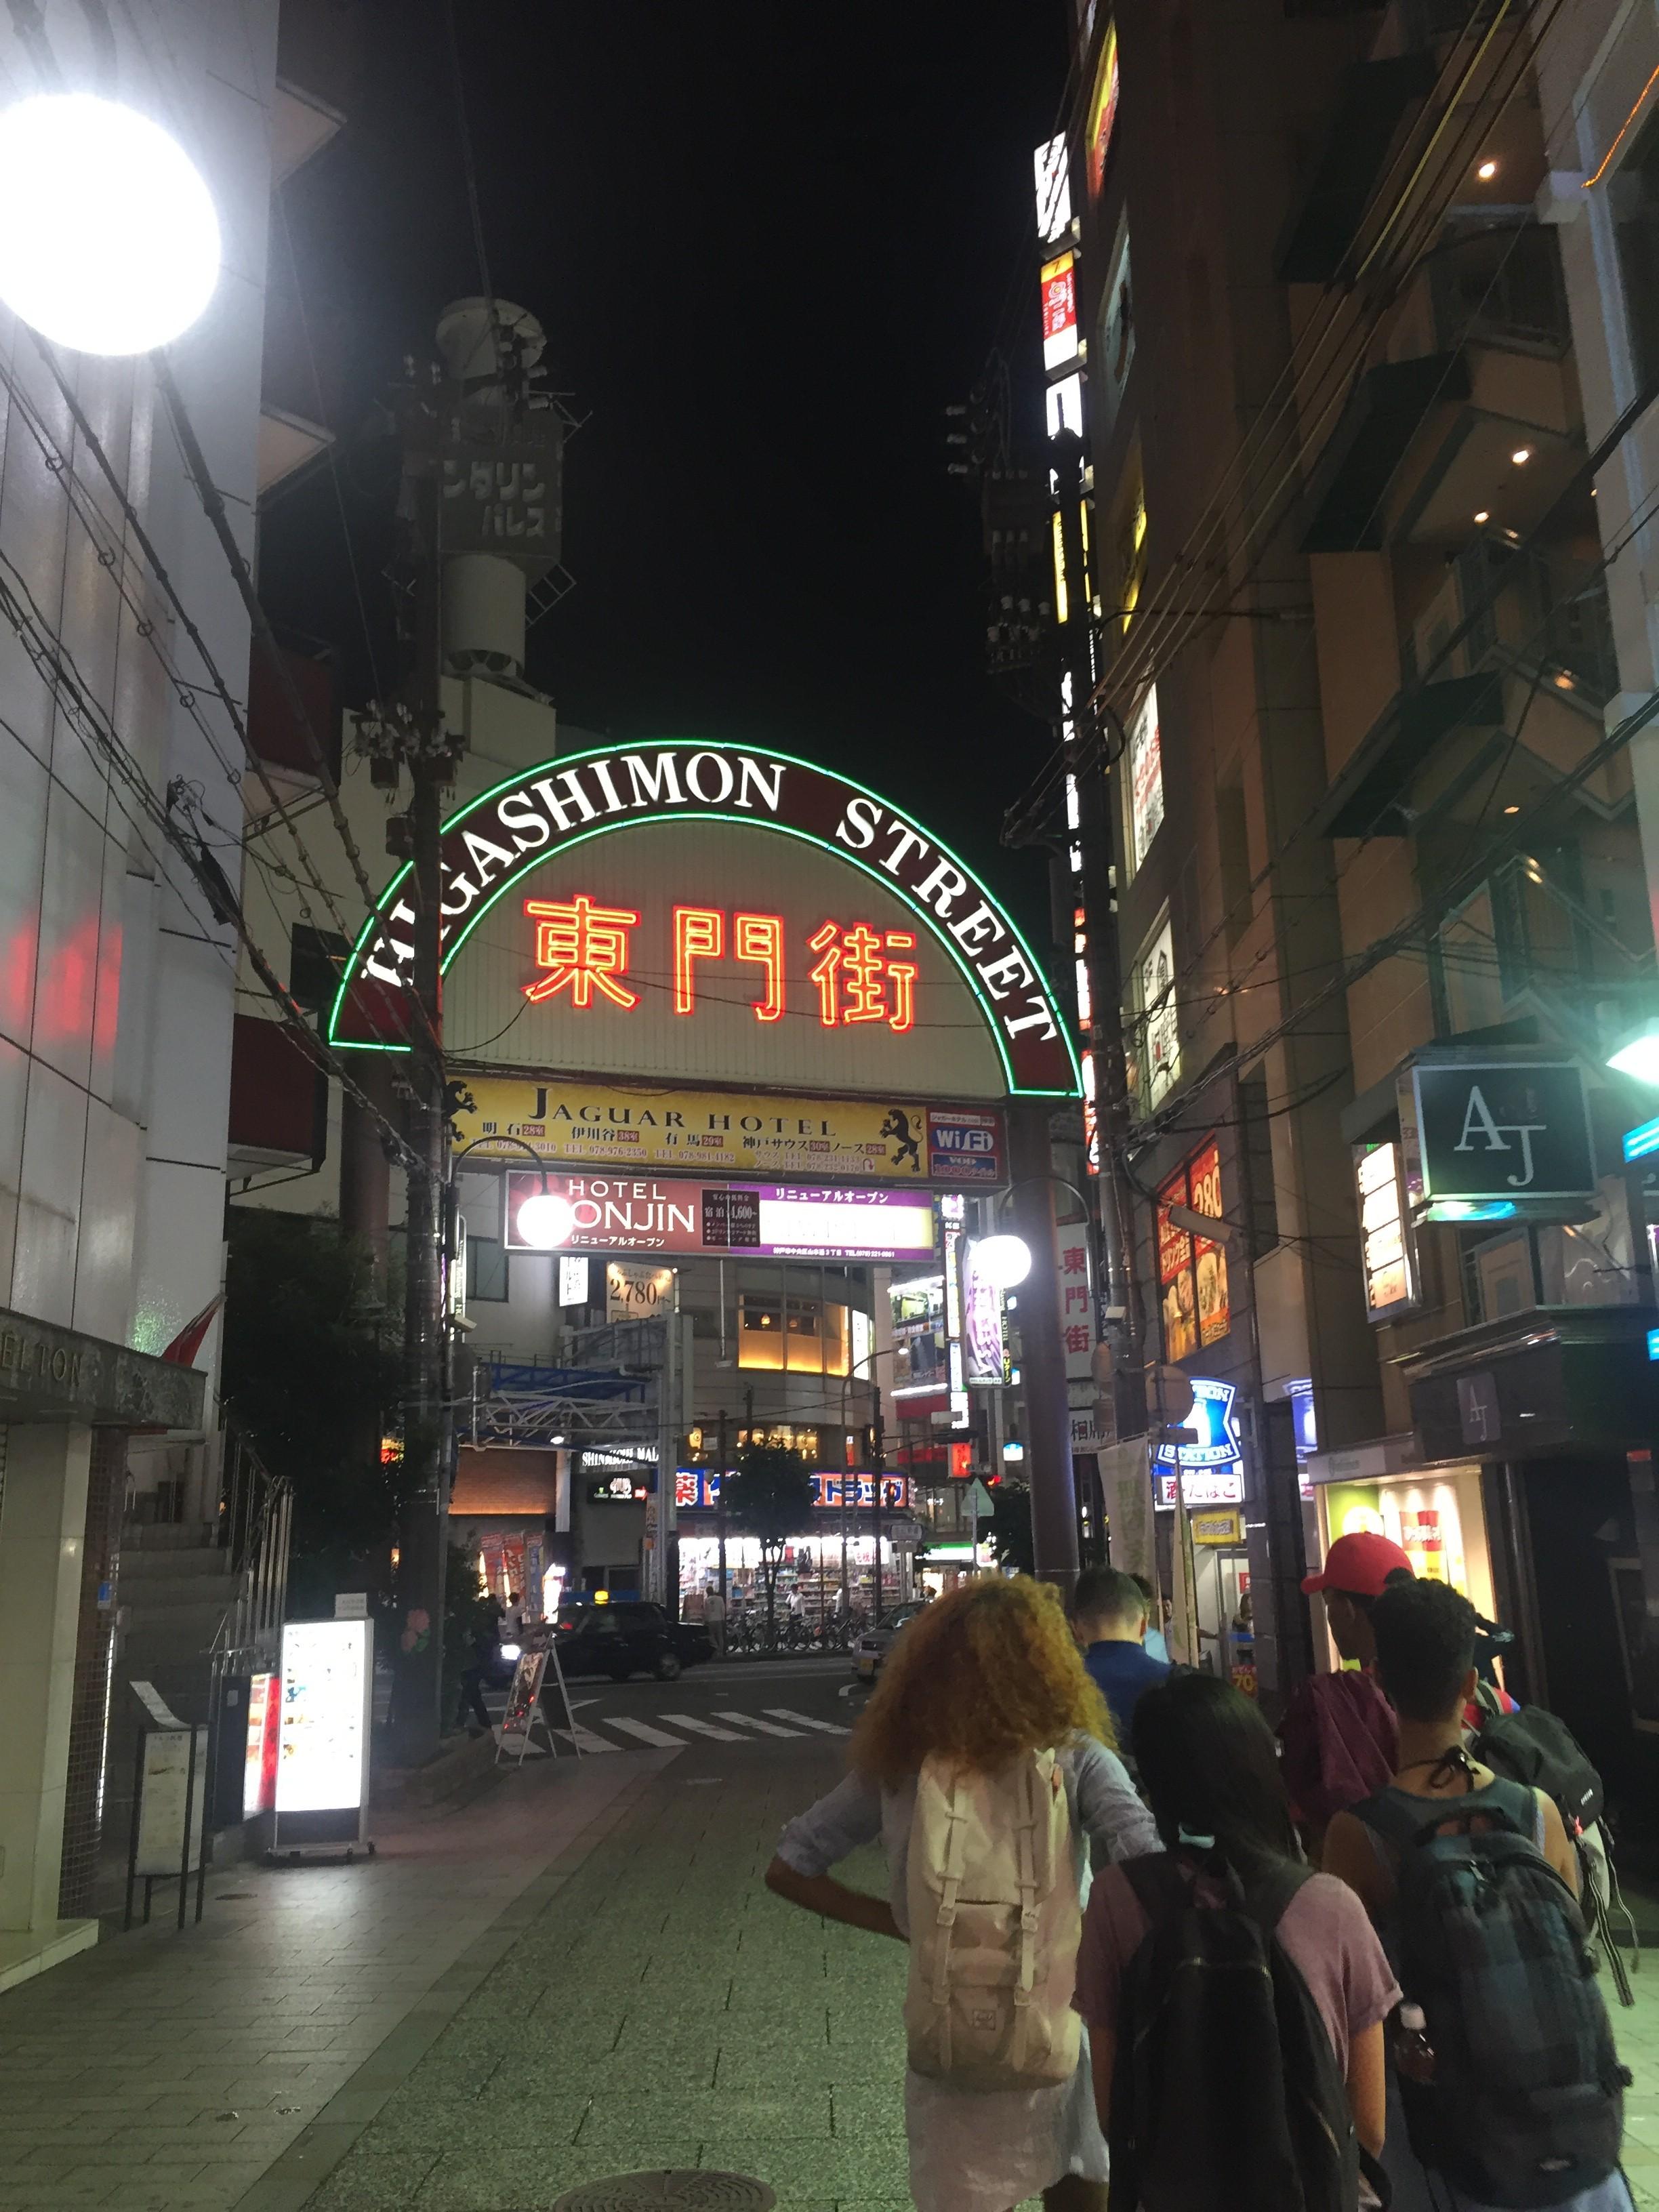 Higashimon street in Kobe.